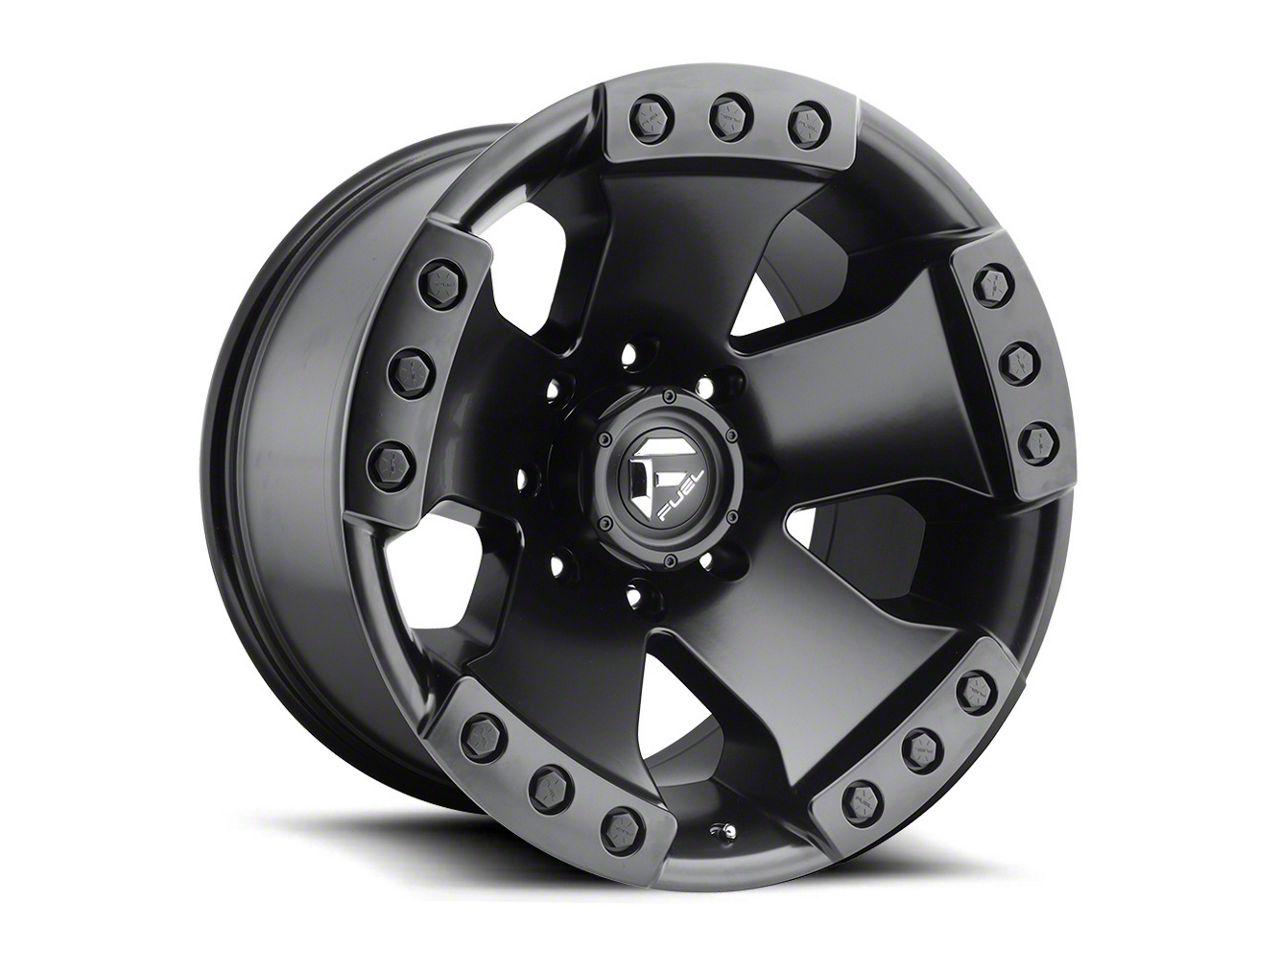 Fuel Wheels Monsta Matte Black 6-Lug Wheel - 20x10 (04-19 F-150)